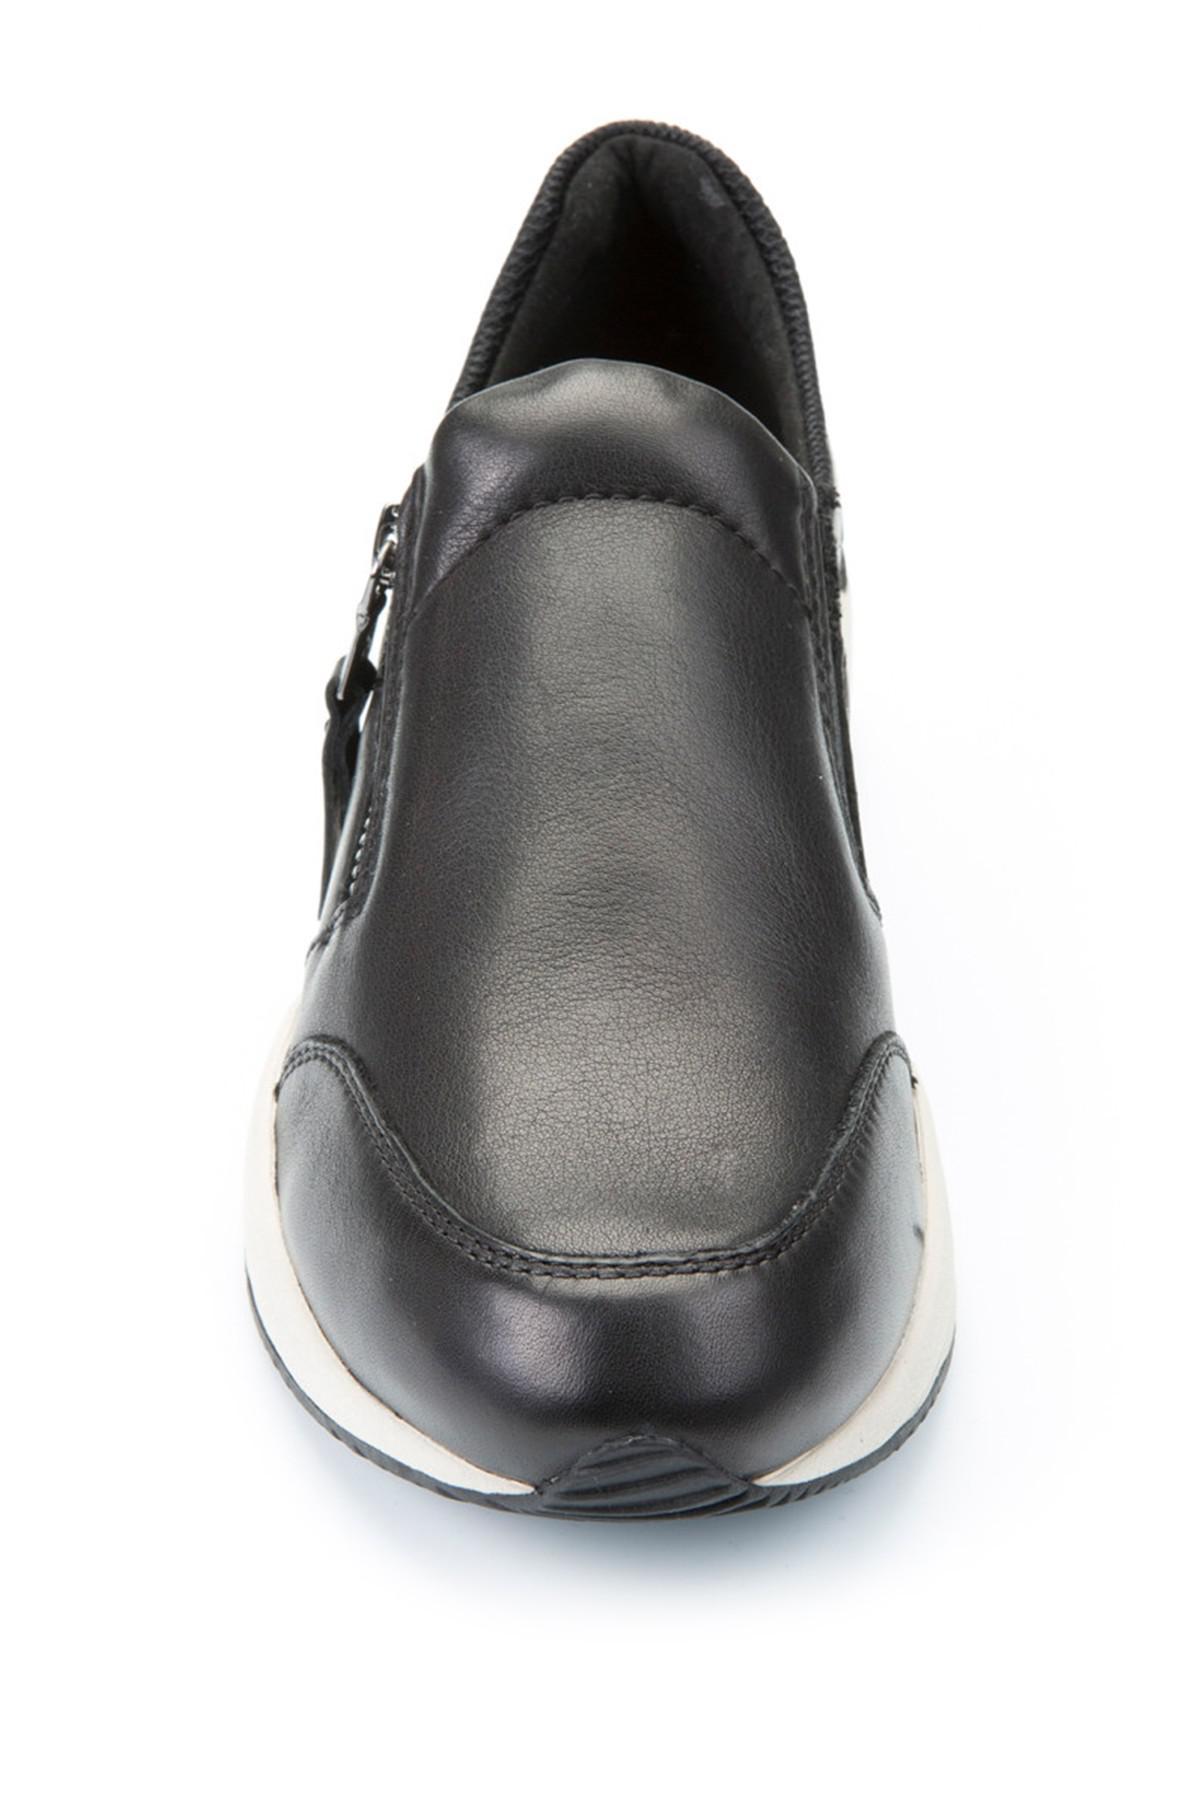 Umiltà punto collina  geox omaya sneaker low price 6dd79 ec227